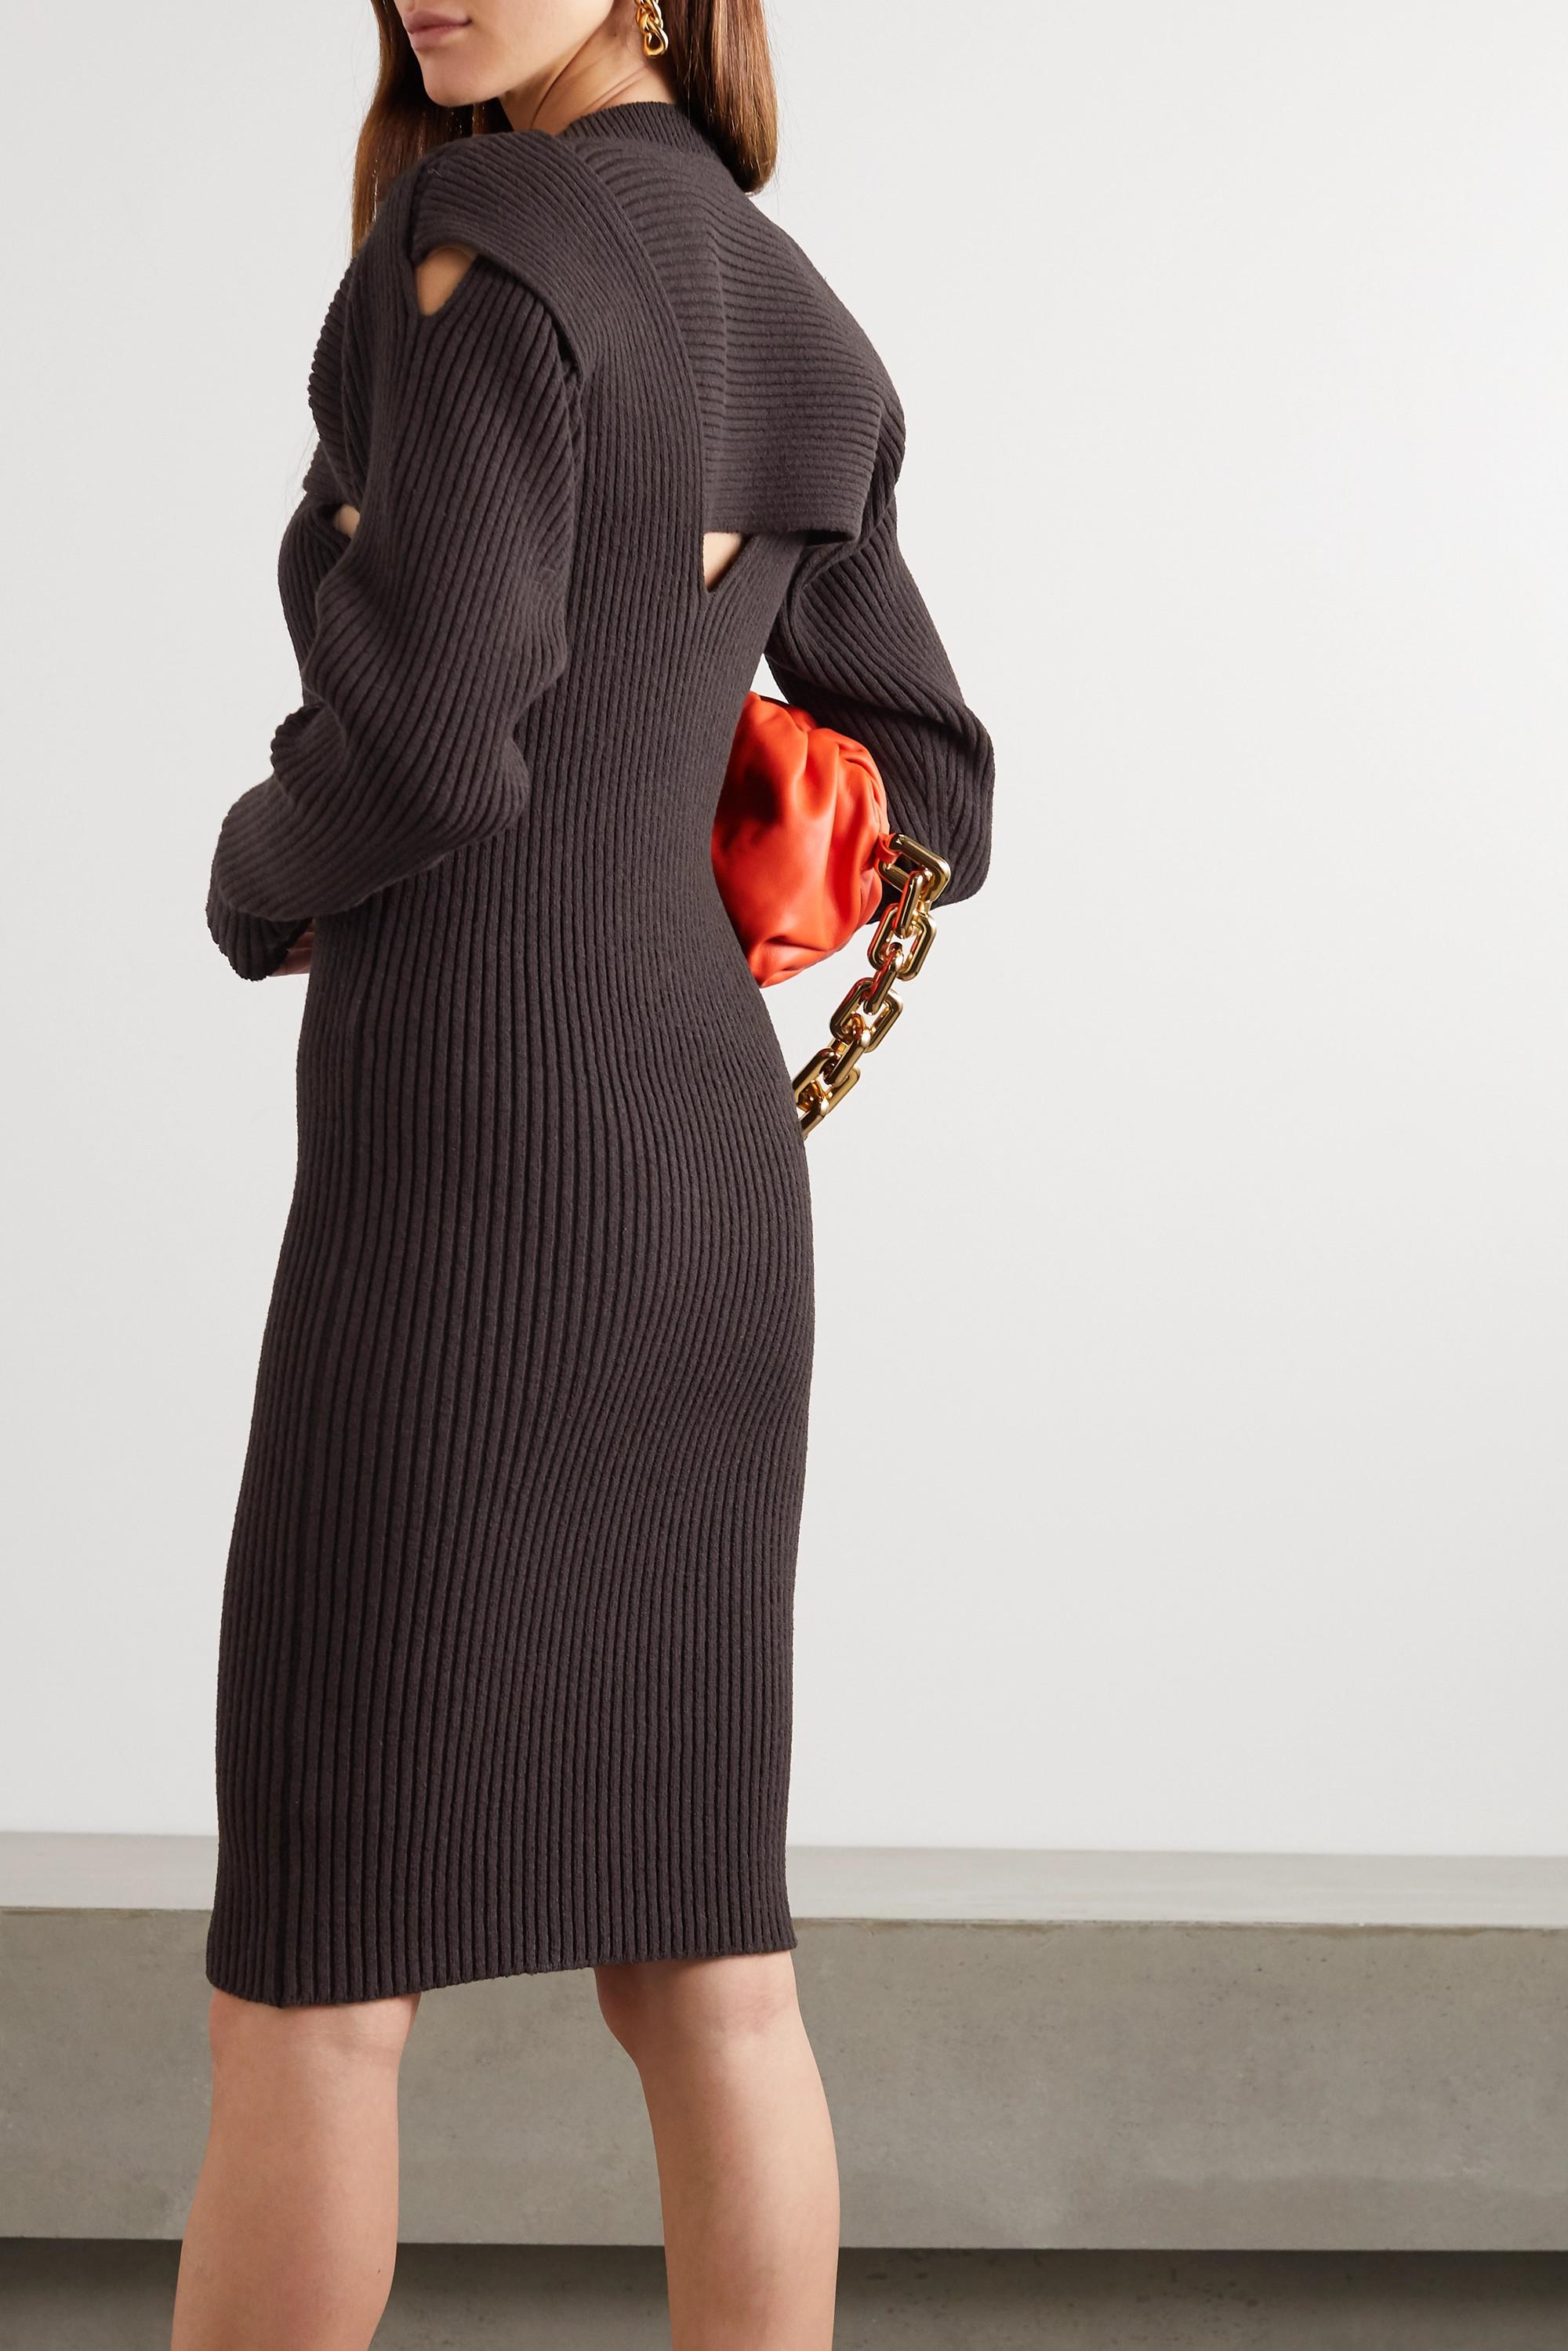 Bottega Veneta Midikleid aus Rippstrick mit Cut-outs